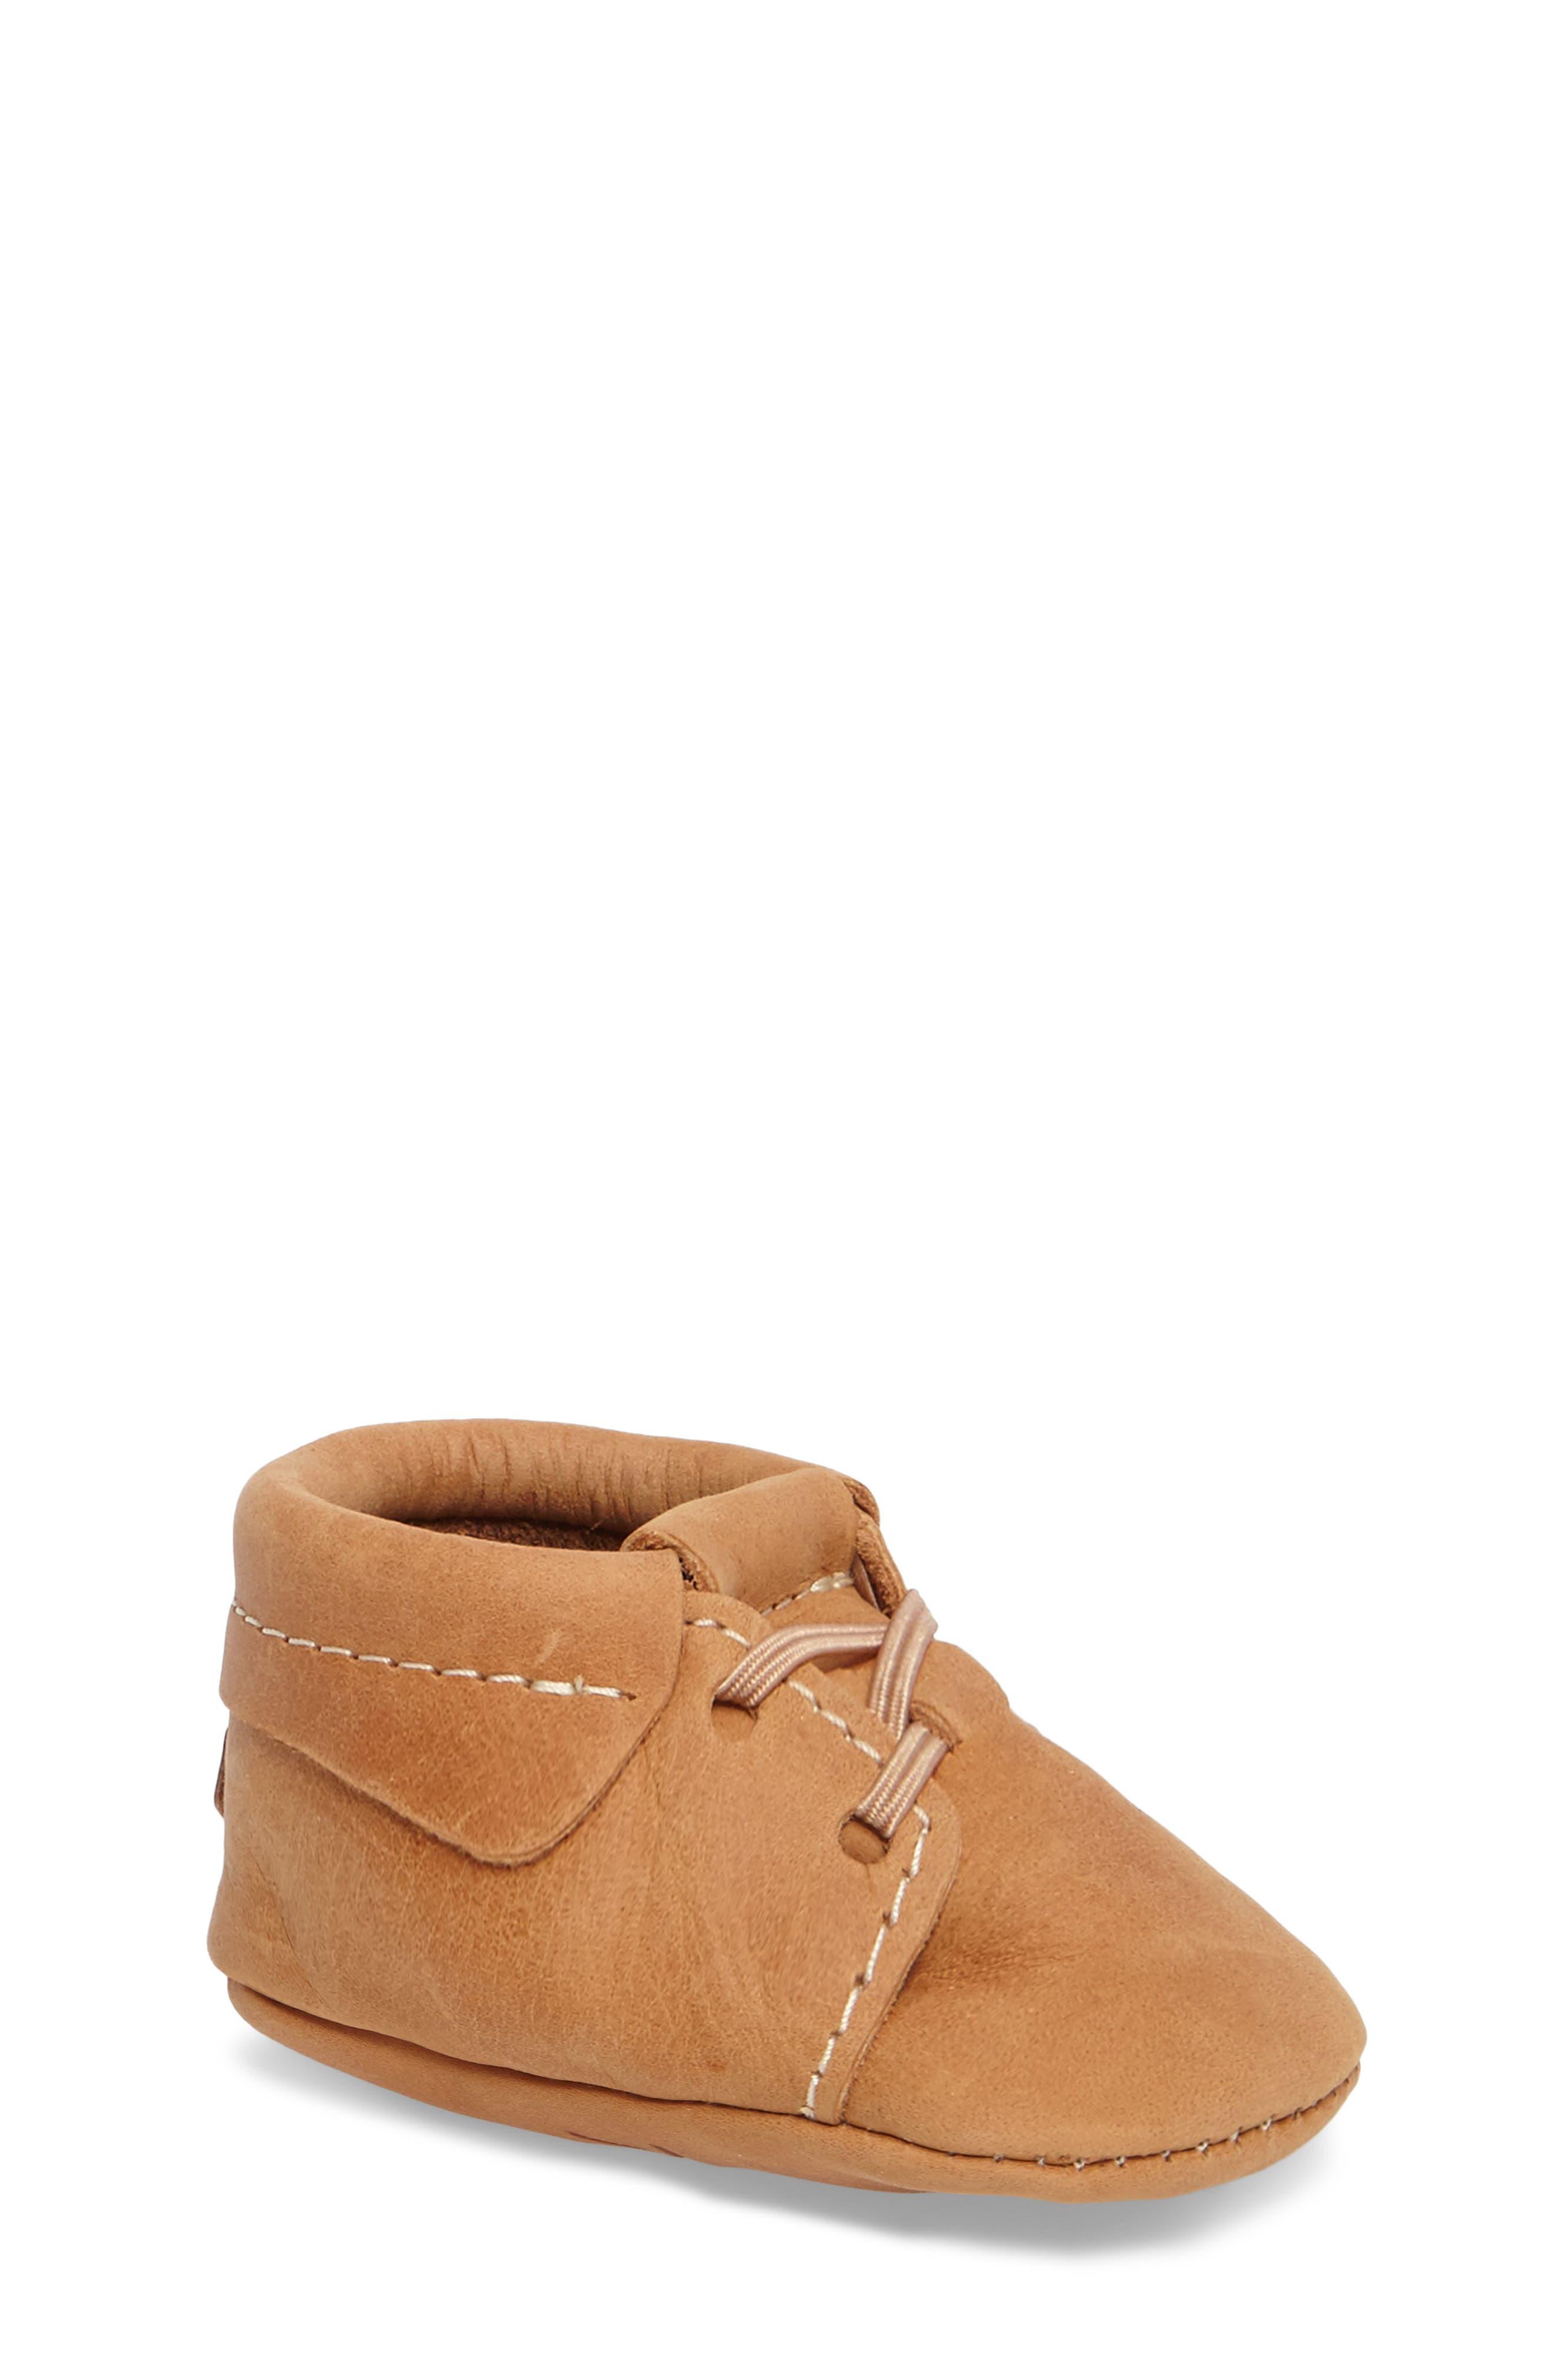 Infant Boys Freshly Picked Oxford Crib Shoe Size 4 M  Brown